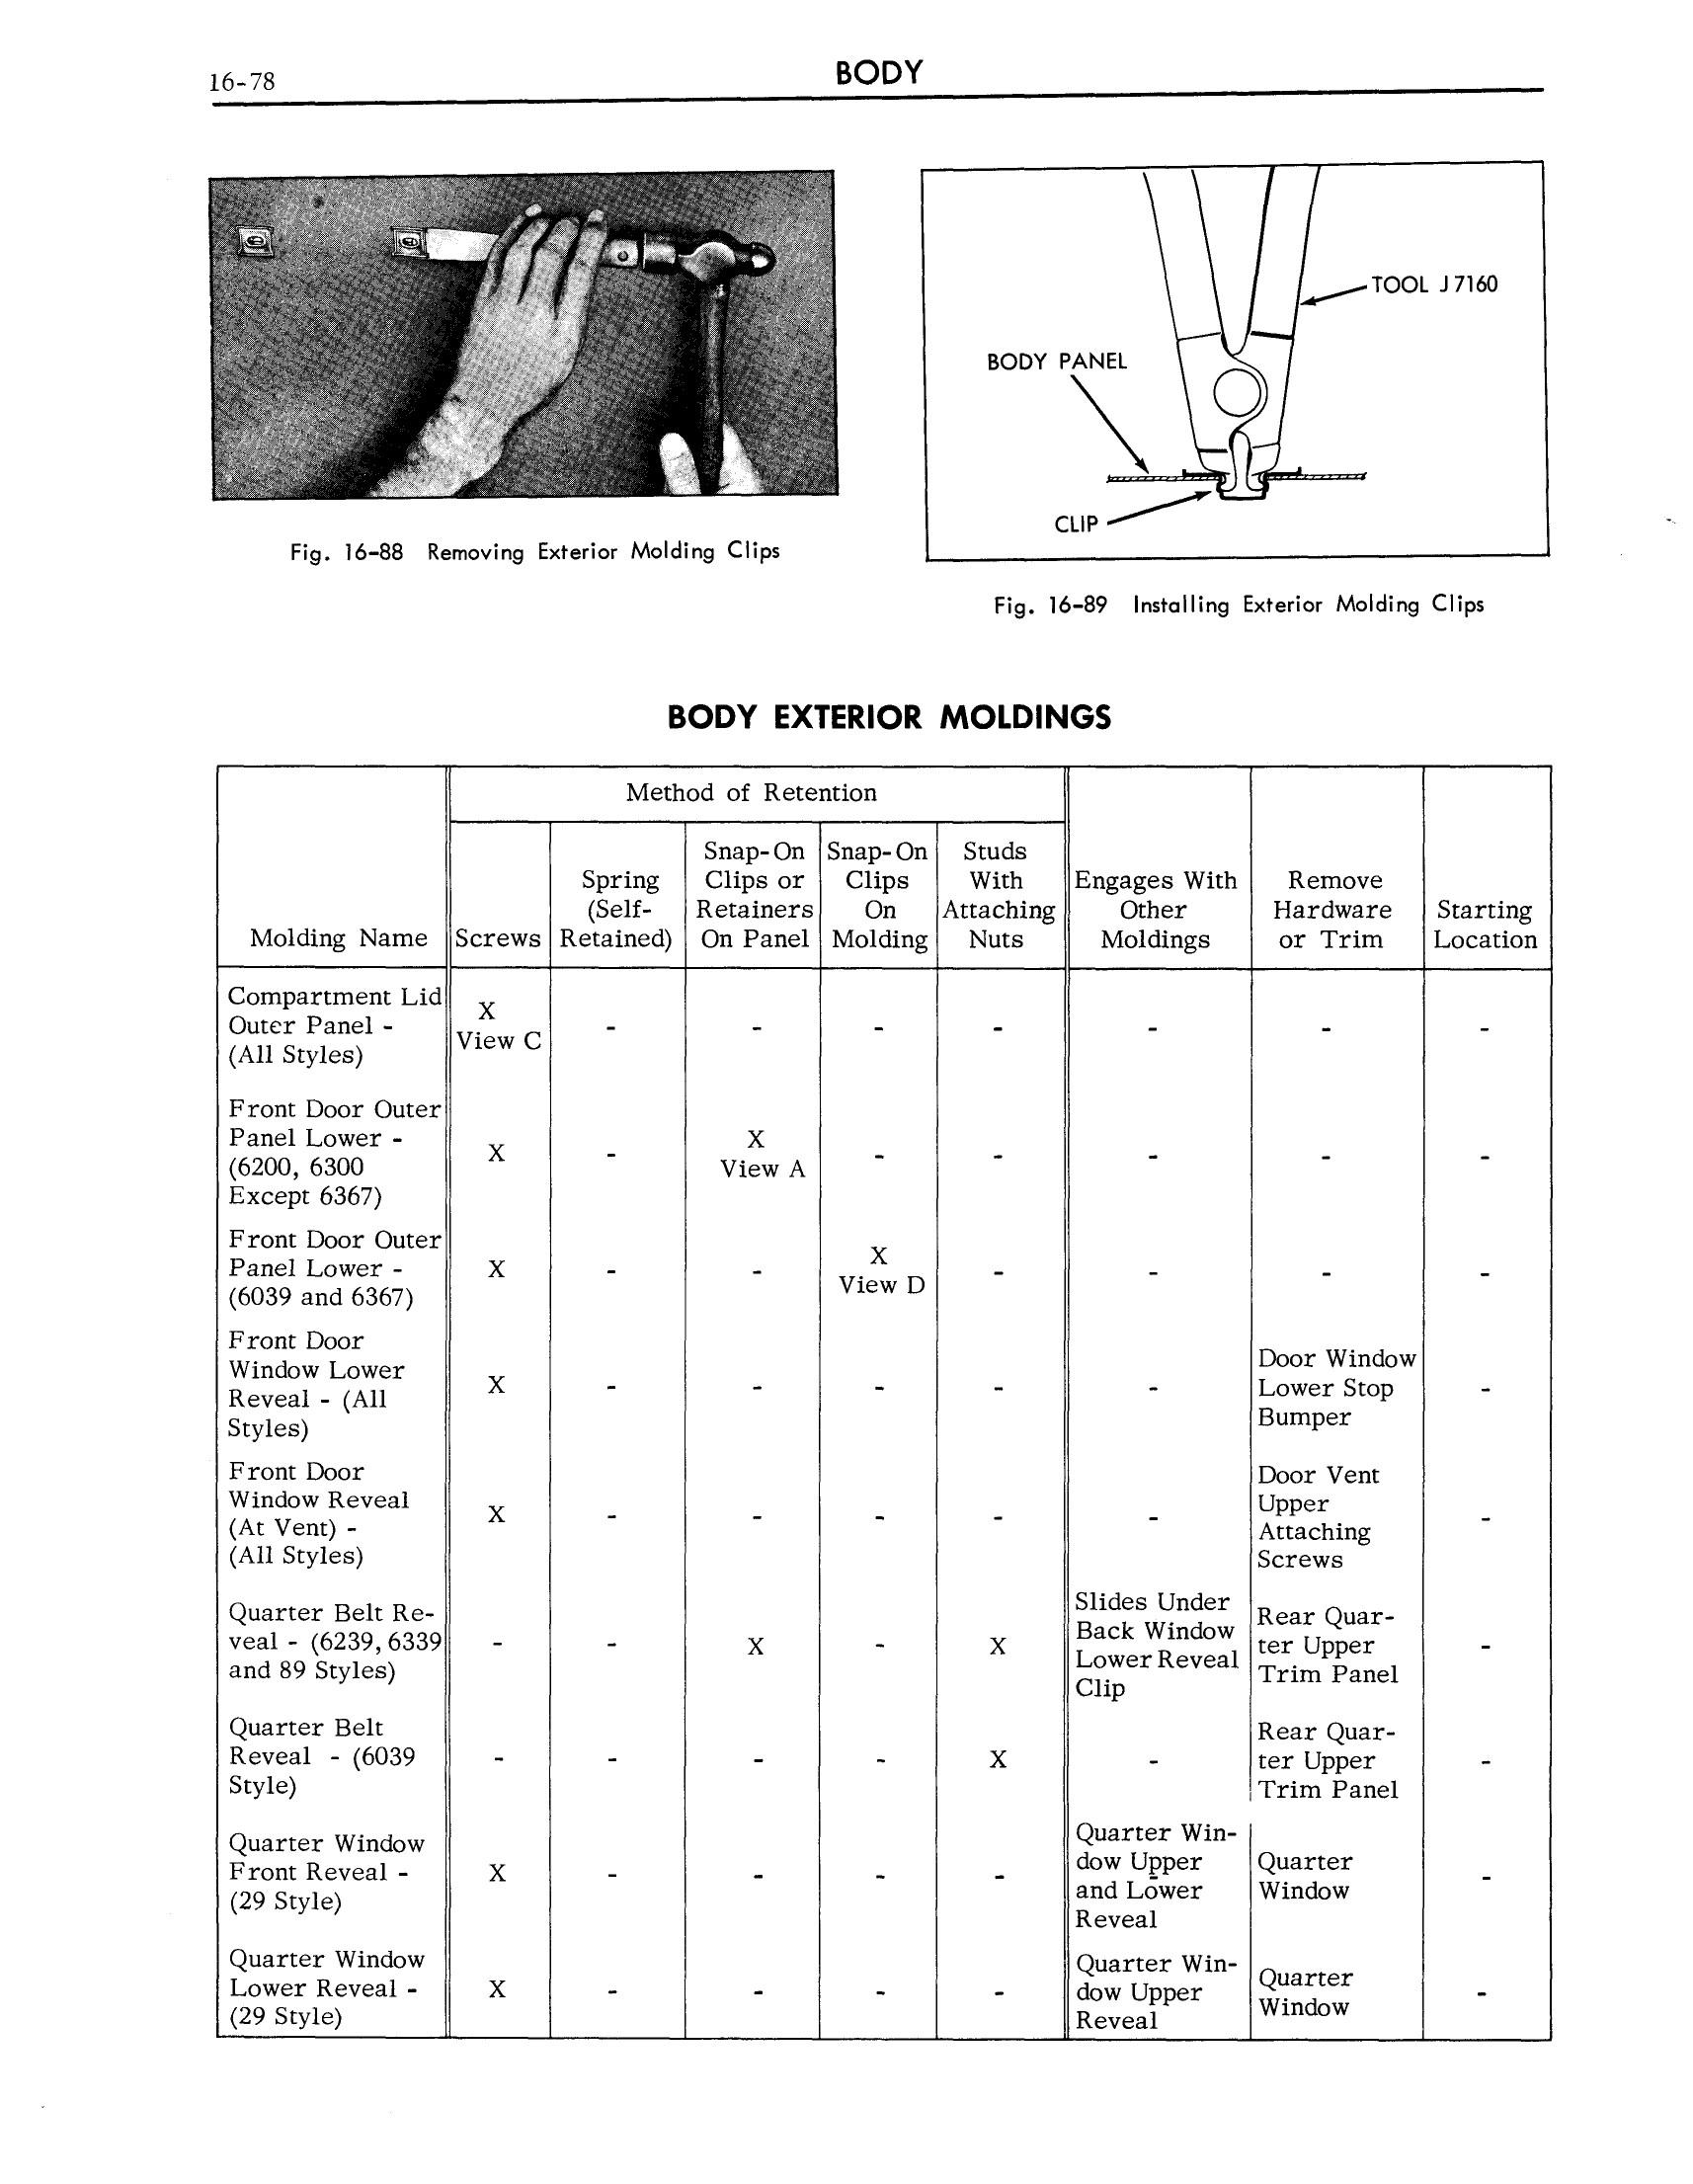 1963 Cadillac Shop Manual- Body Page 78 of 124